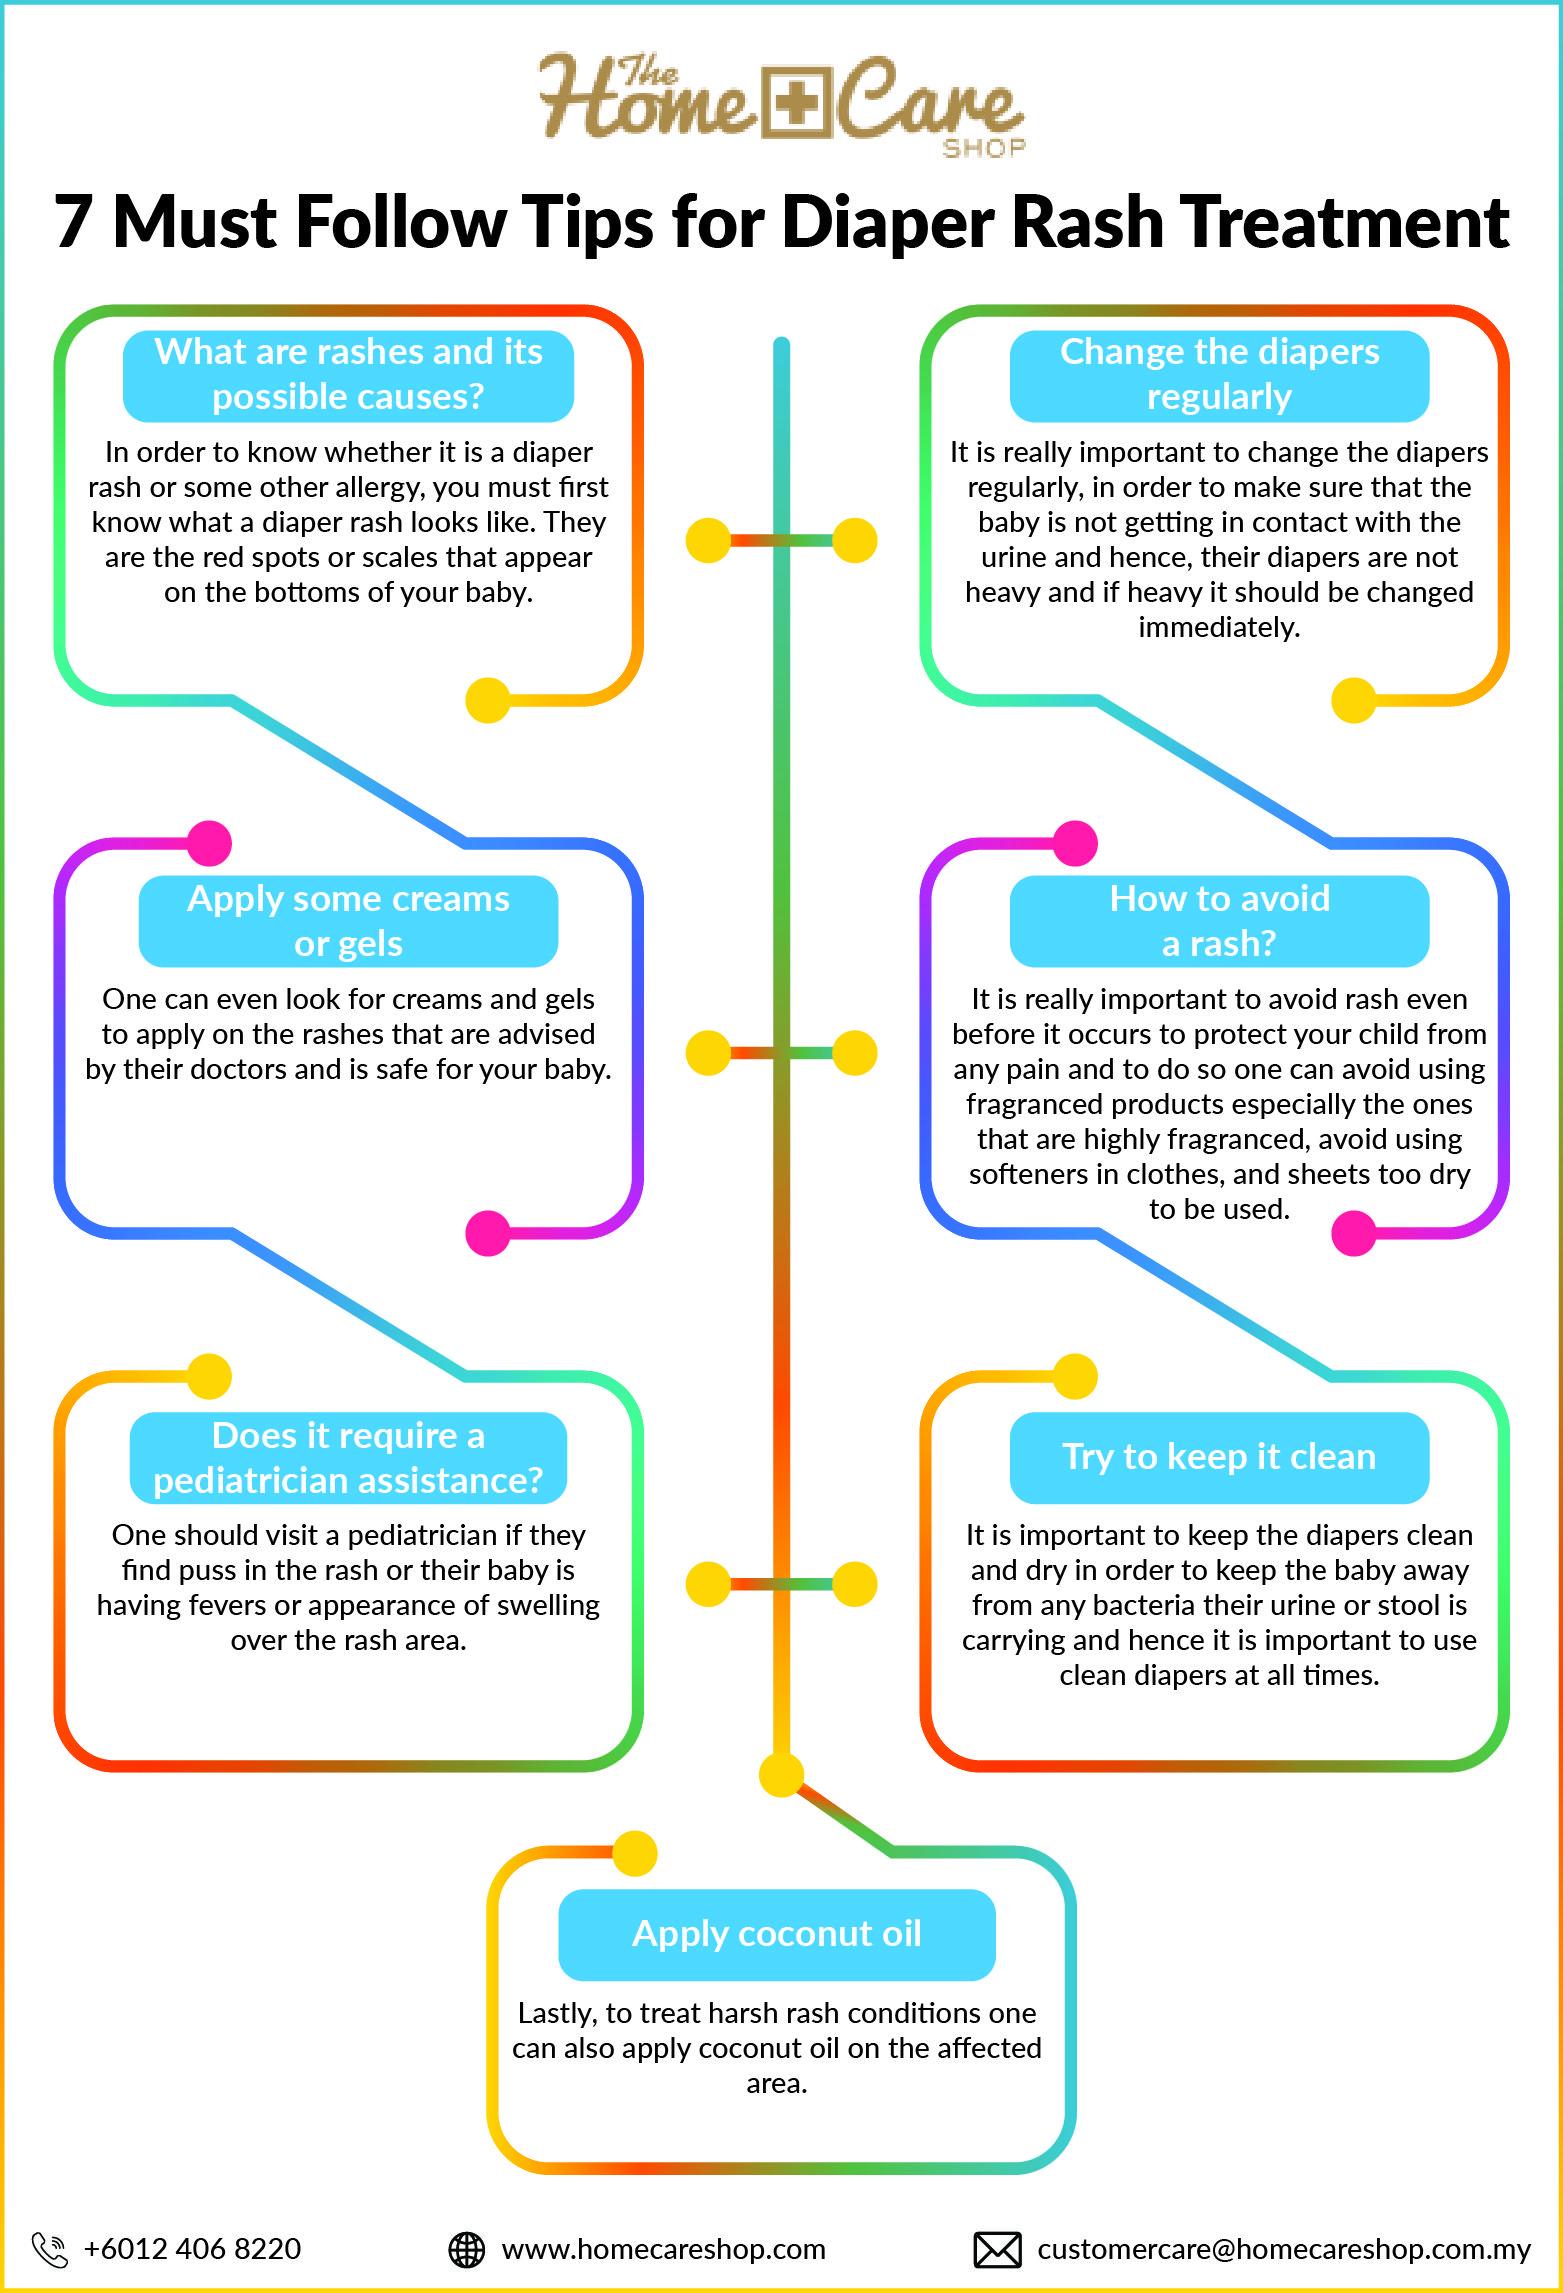 7 Must Follow Tips for Diaper Rash Treatment